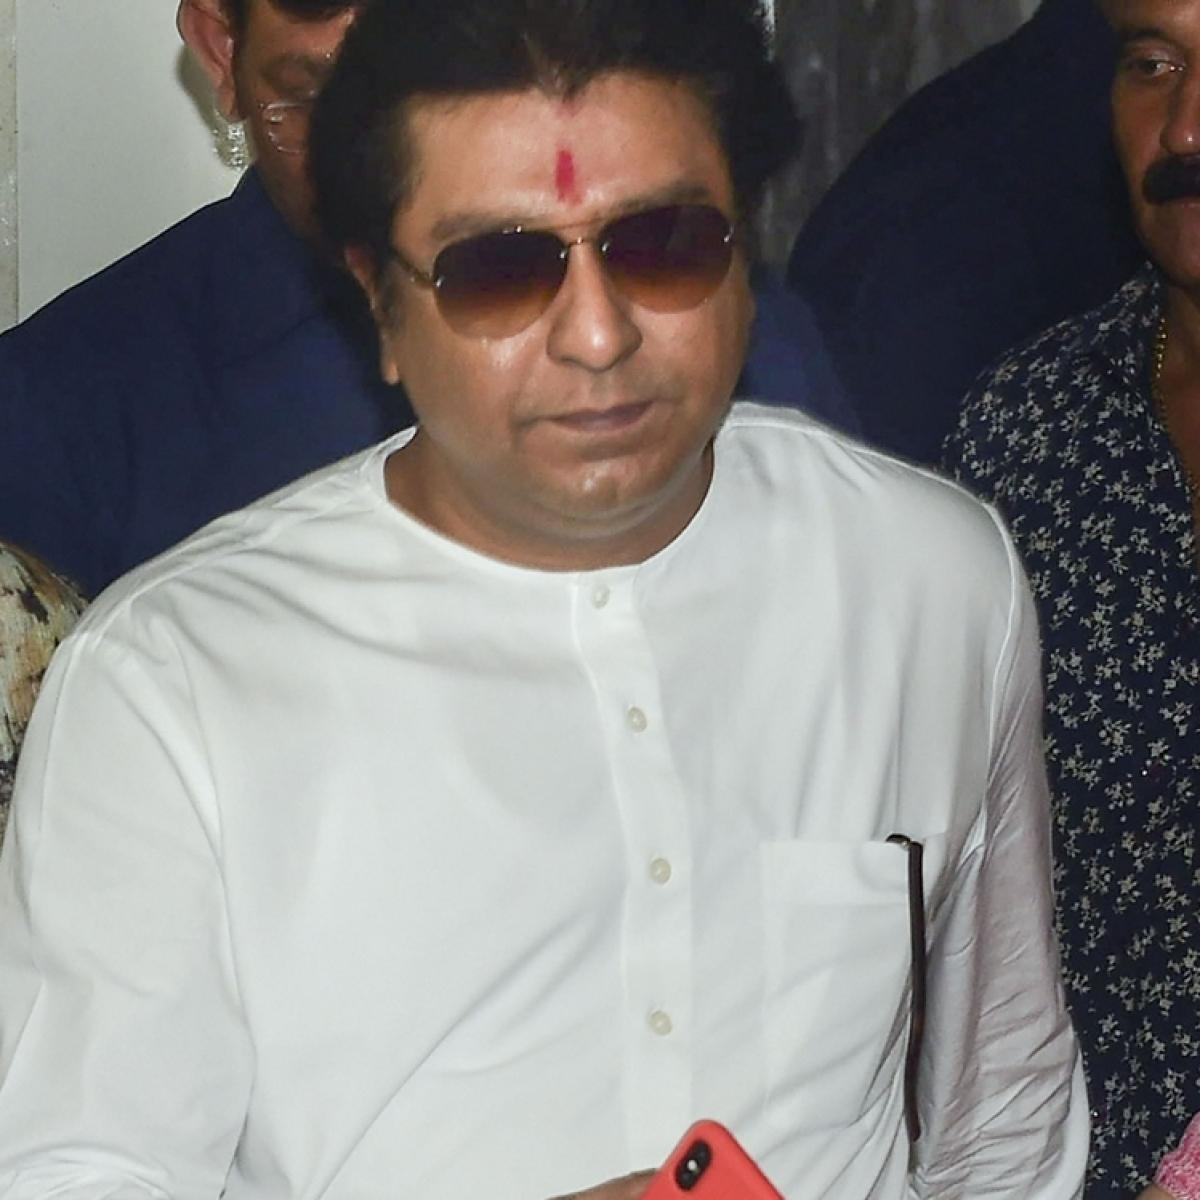 Is PM Modi-baiter Raj Thackeray going the 'Lotus' way?